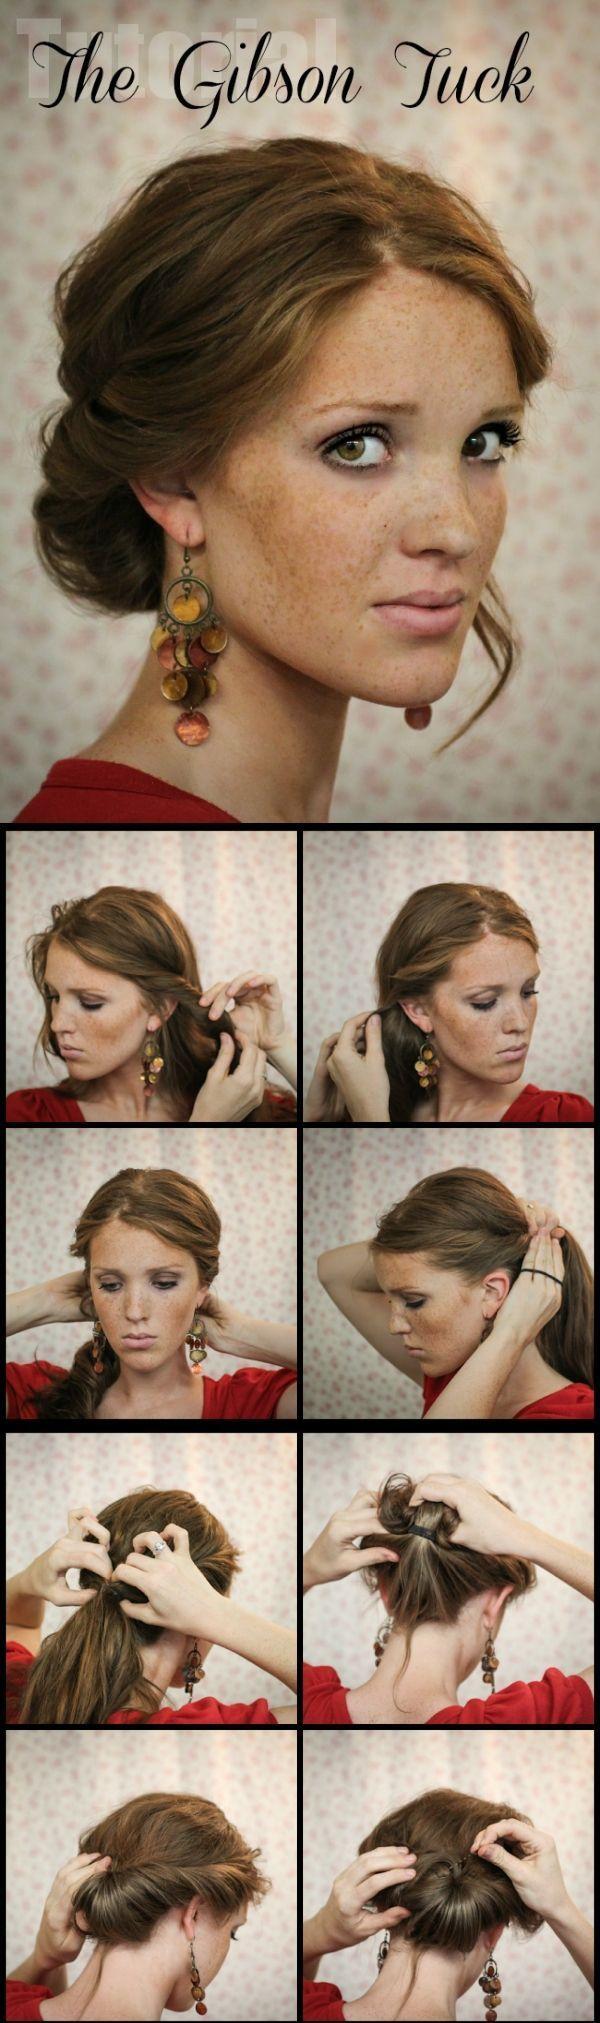 The gibson tuck diy step by step hair tutorial hairstyles the gibson tuck diy step by step hair tutorial hairstyles haircuts hairstyles baditri Gallery